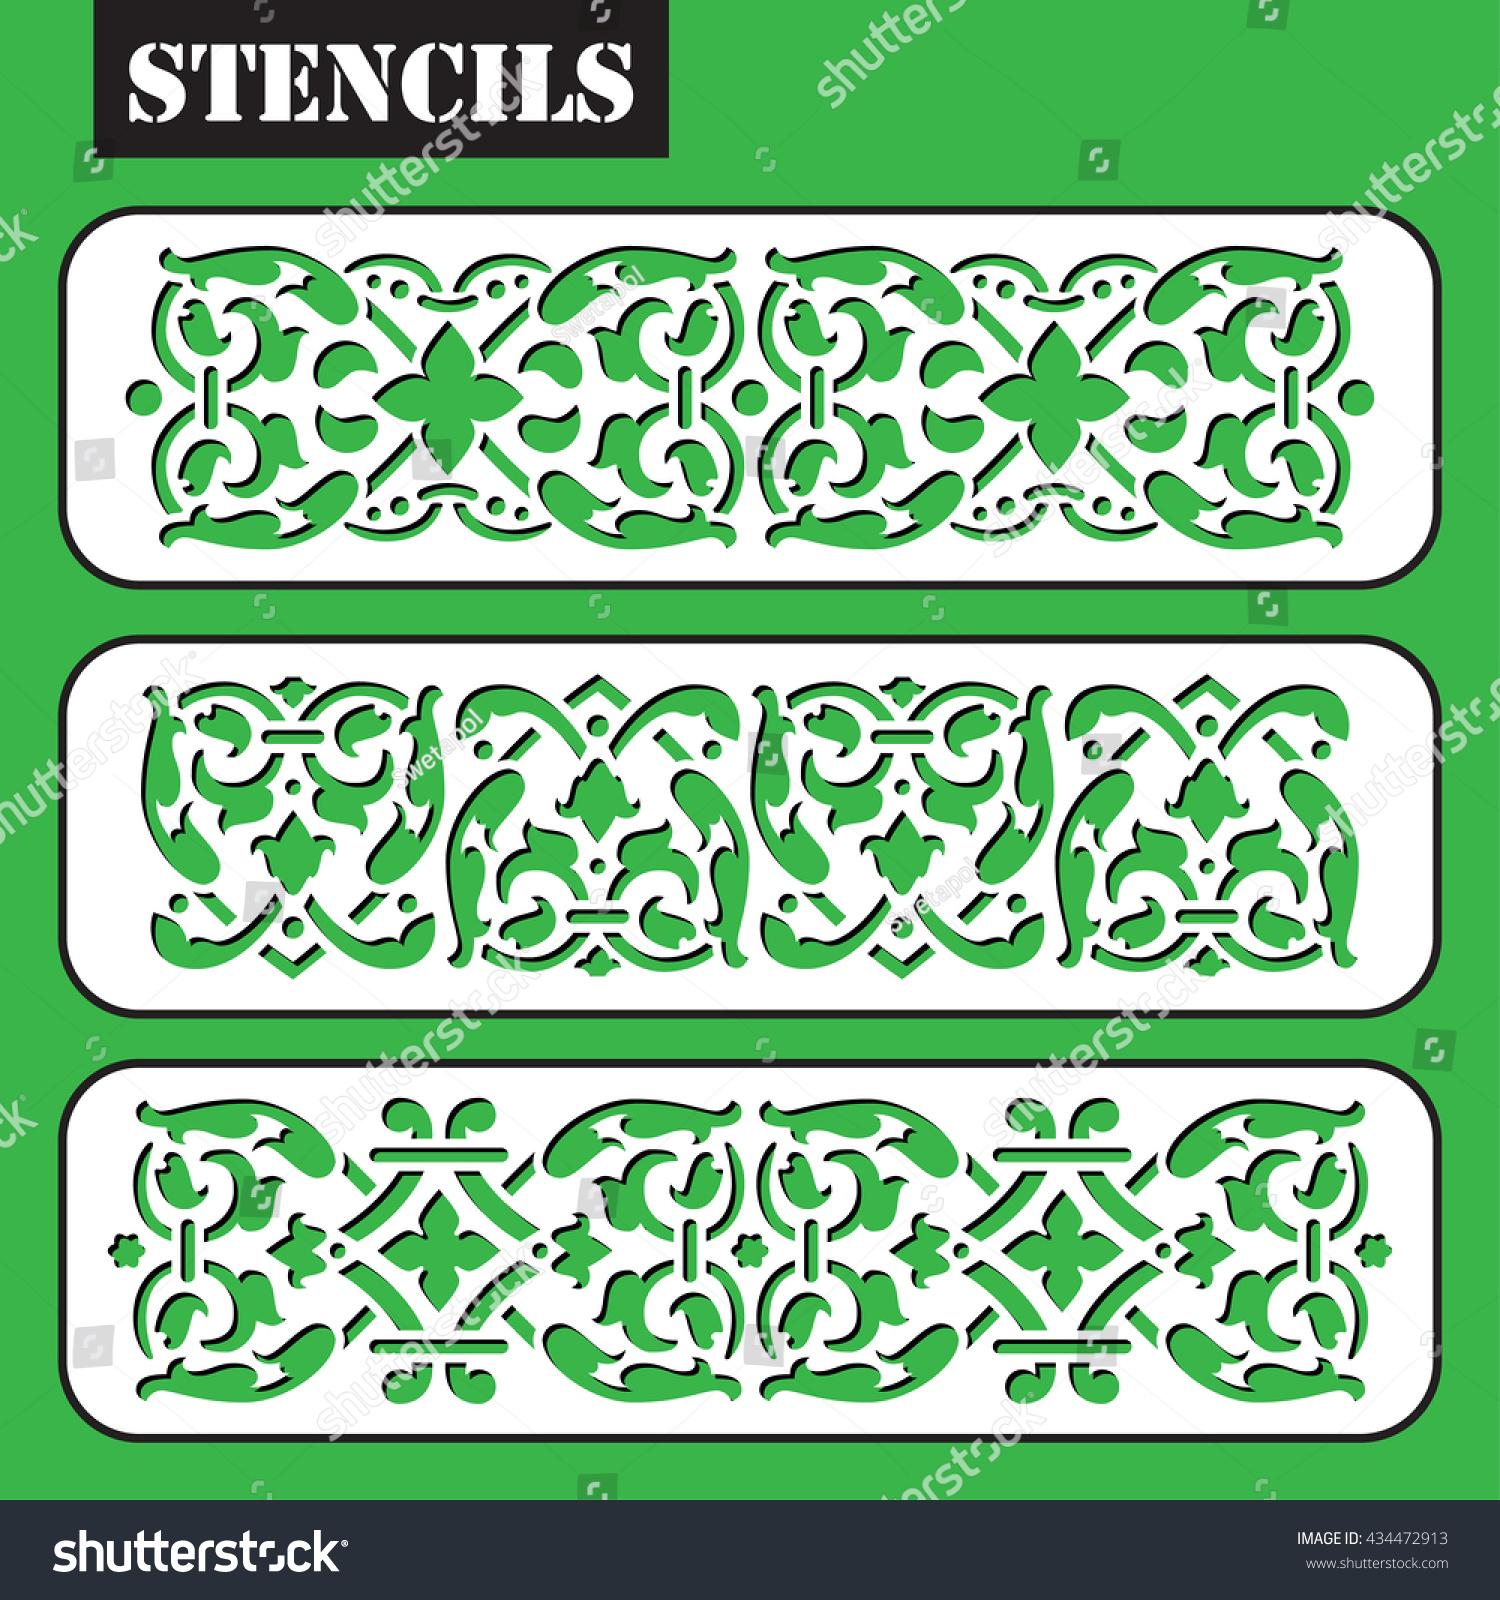 ... arabic decorative calligraphy design. Laser cutting wall art decor